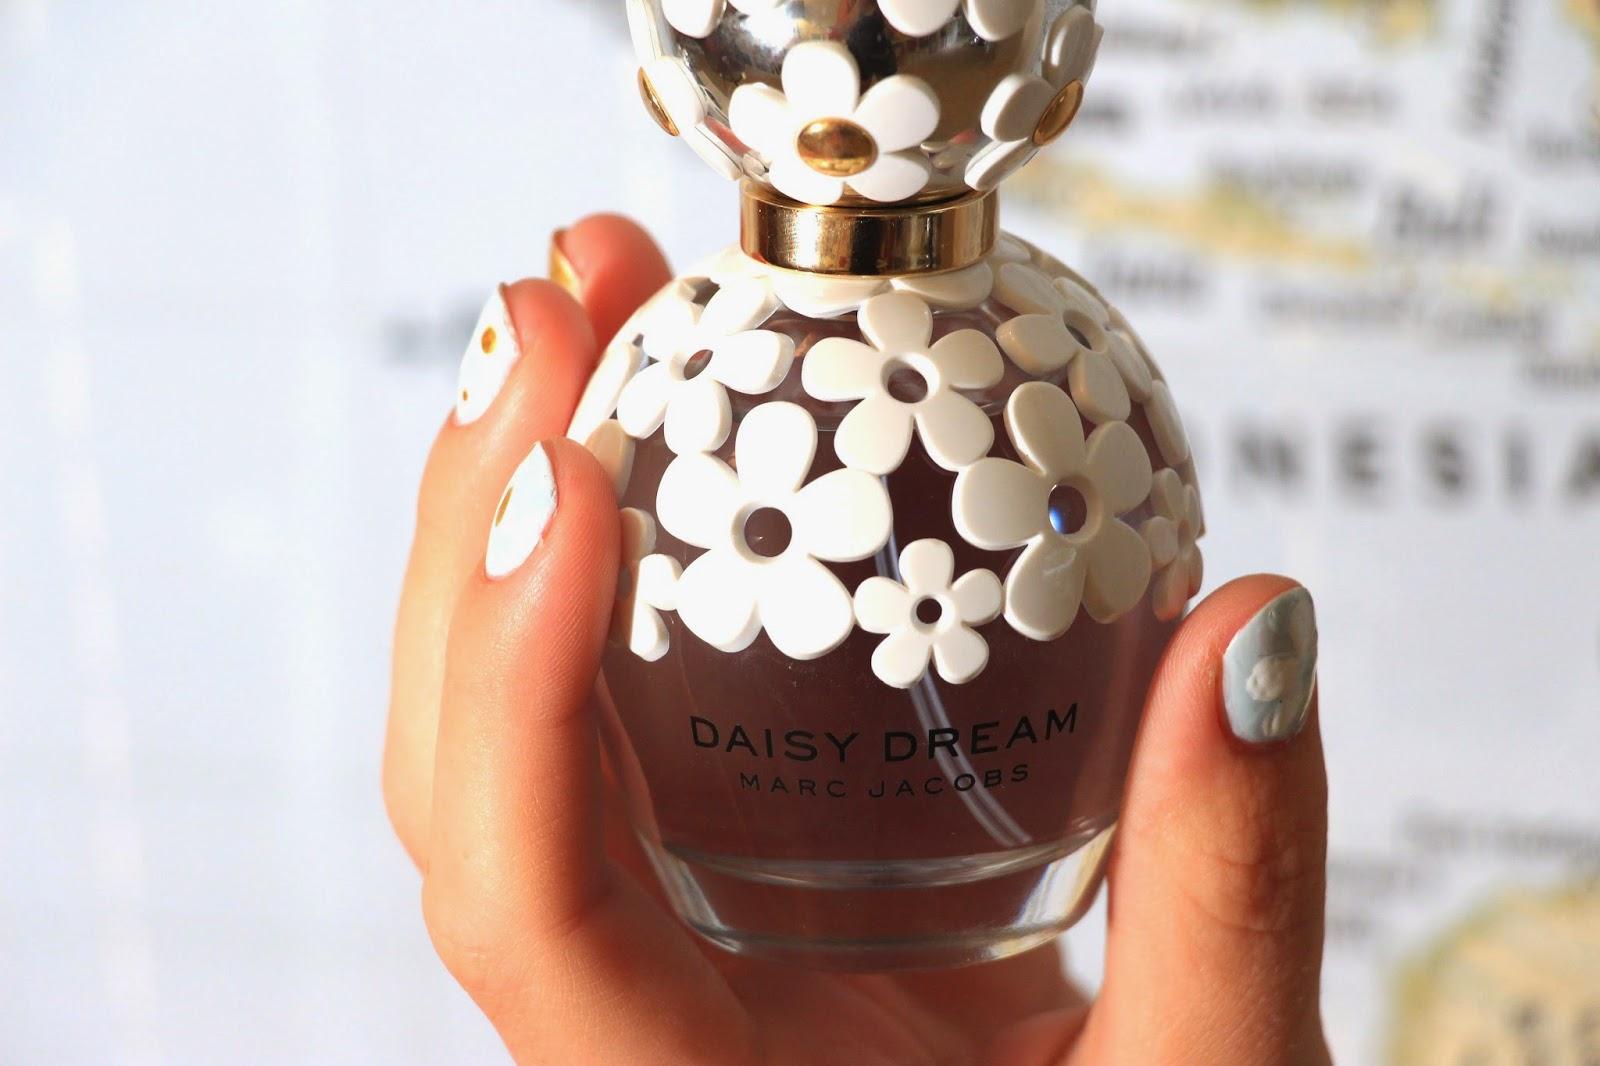 Daisy Dream, Marc Jacobs perfume, summer sent, perfume 2014, parfum estival